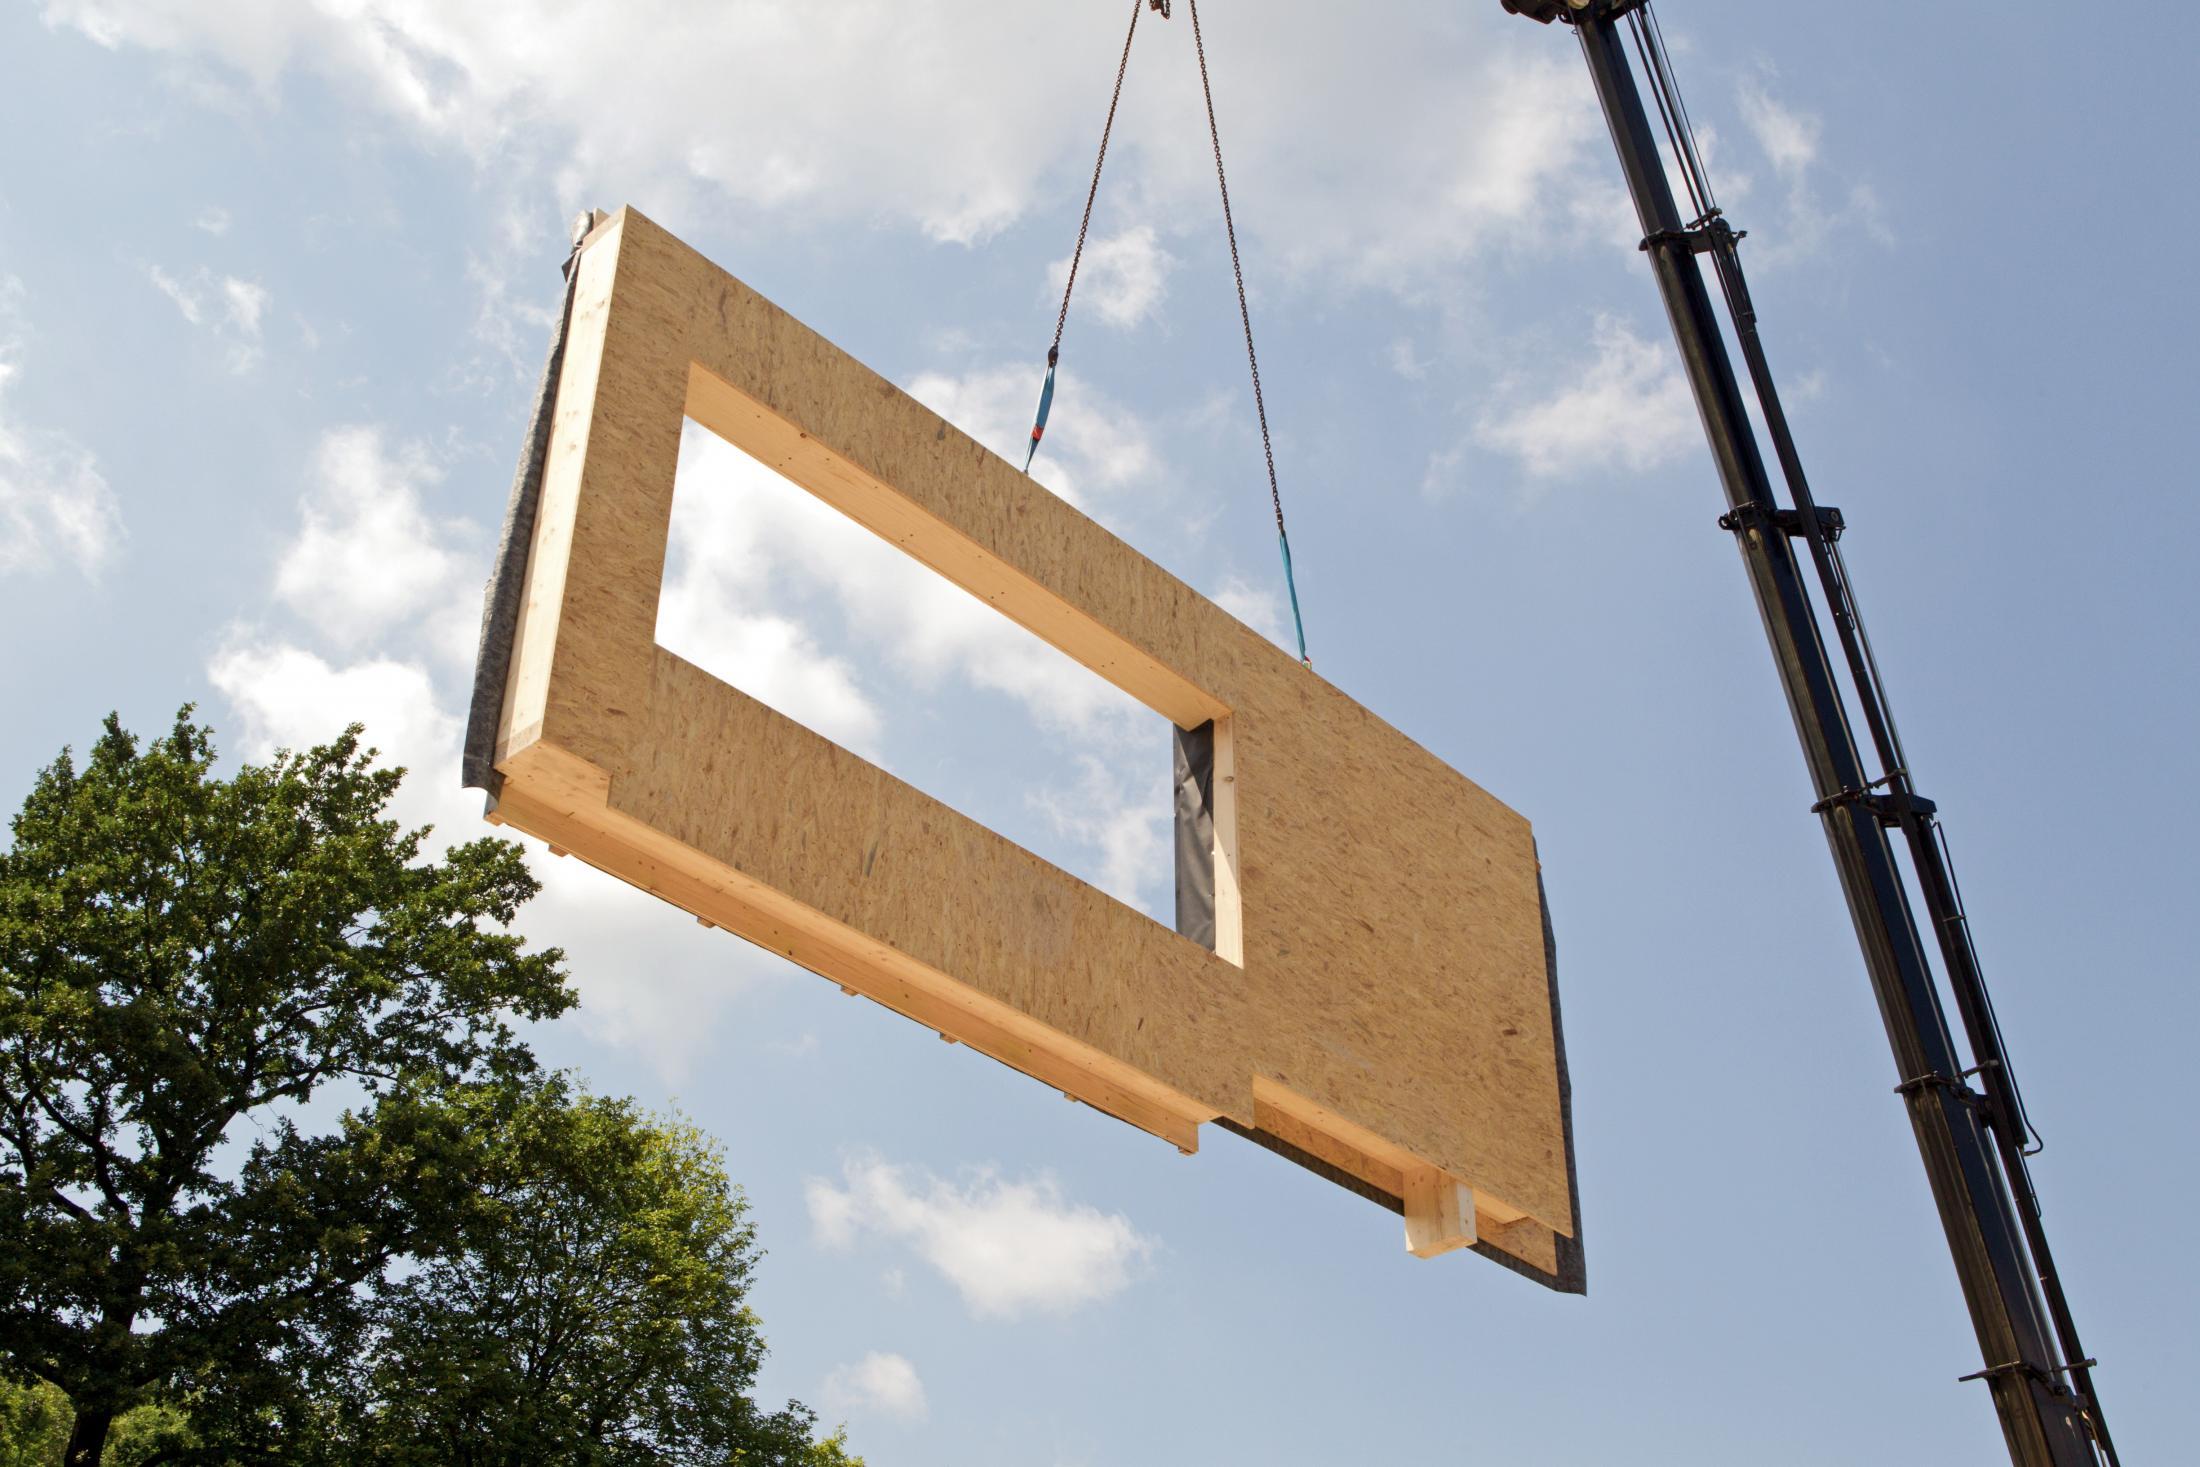 Flächige Komplettsysteme: Holzbau mit dem Wow-Effekt